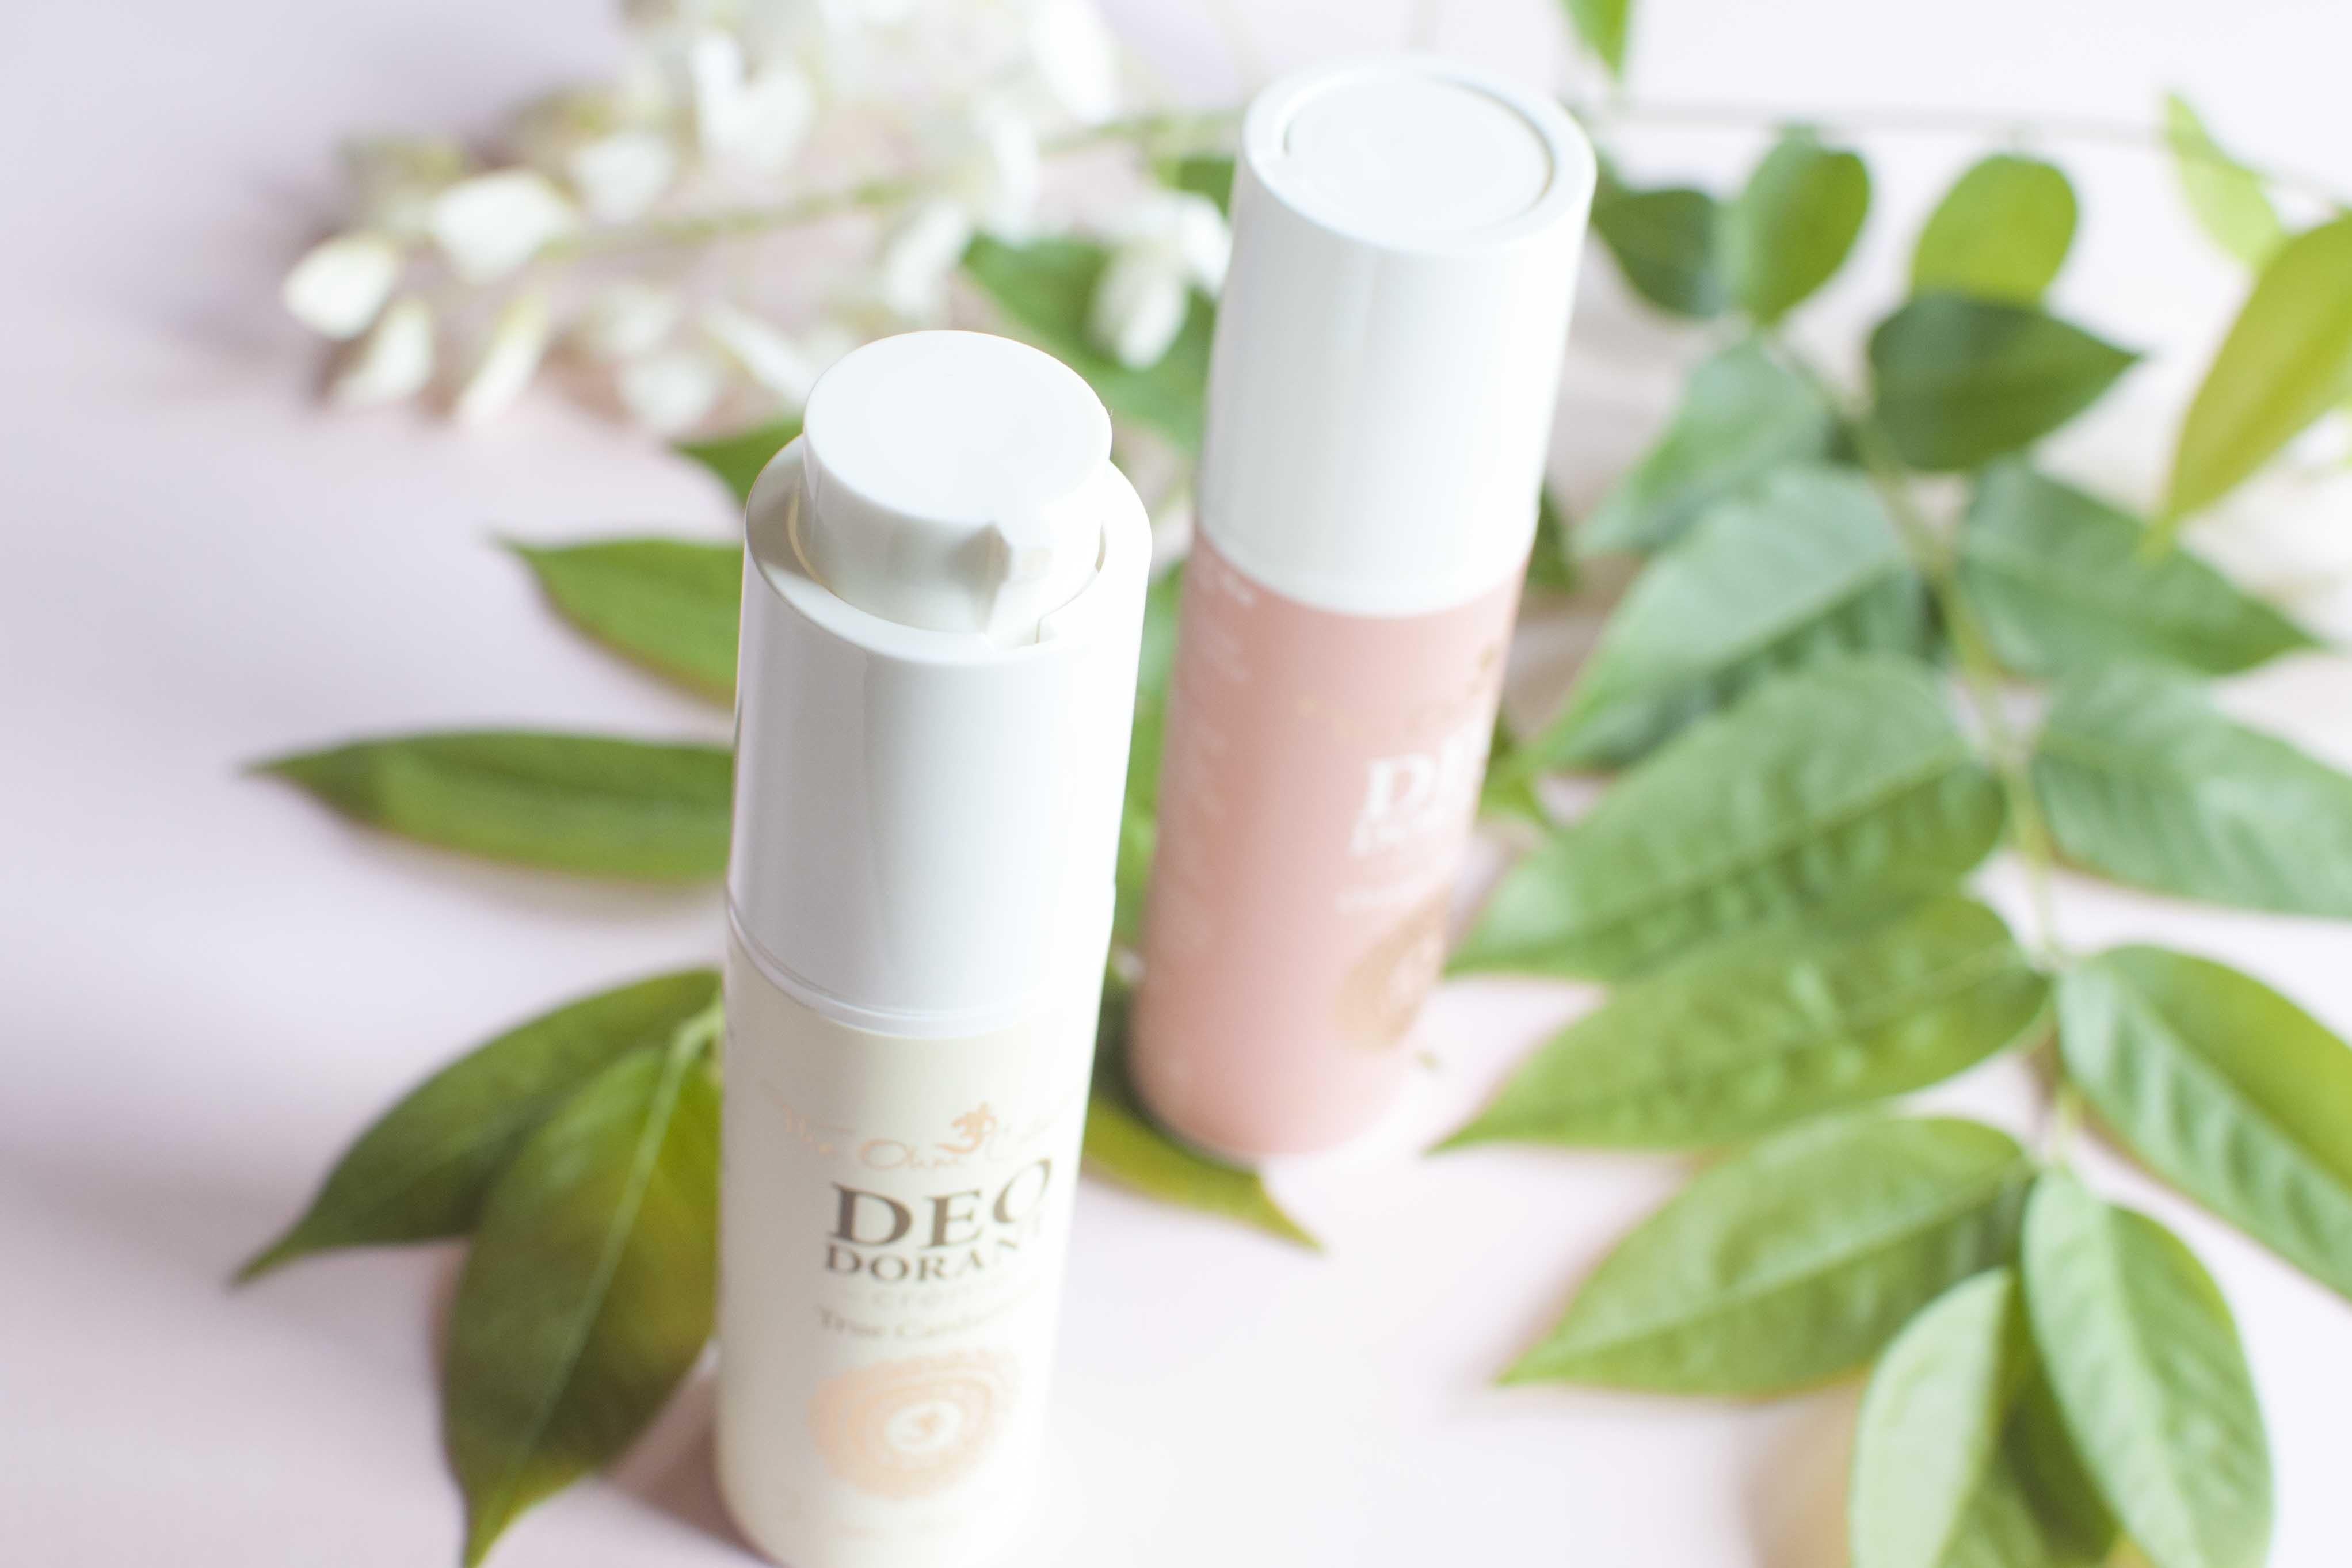 review the ohm collection deodorant creme natural deodorant no aluminium